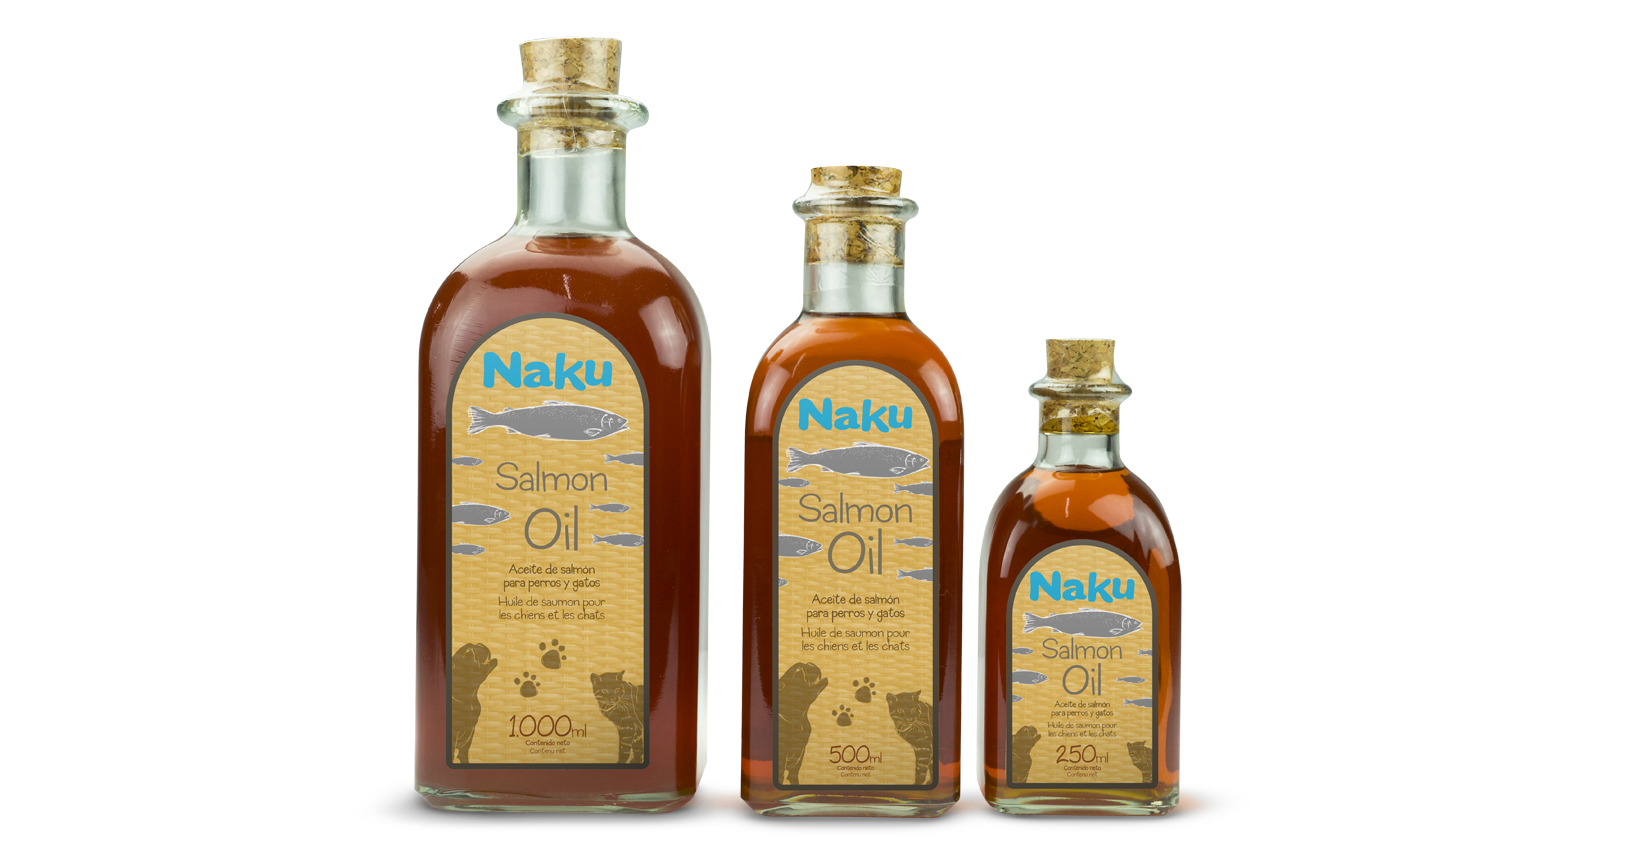 Naku Salmon Oil